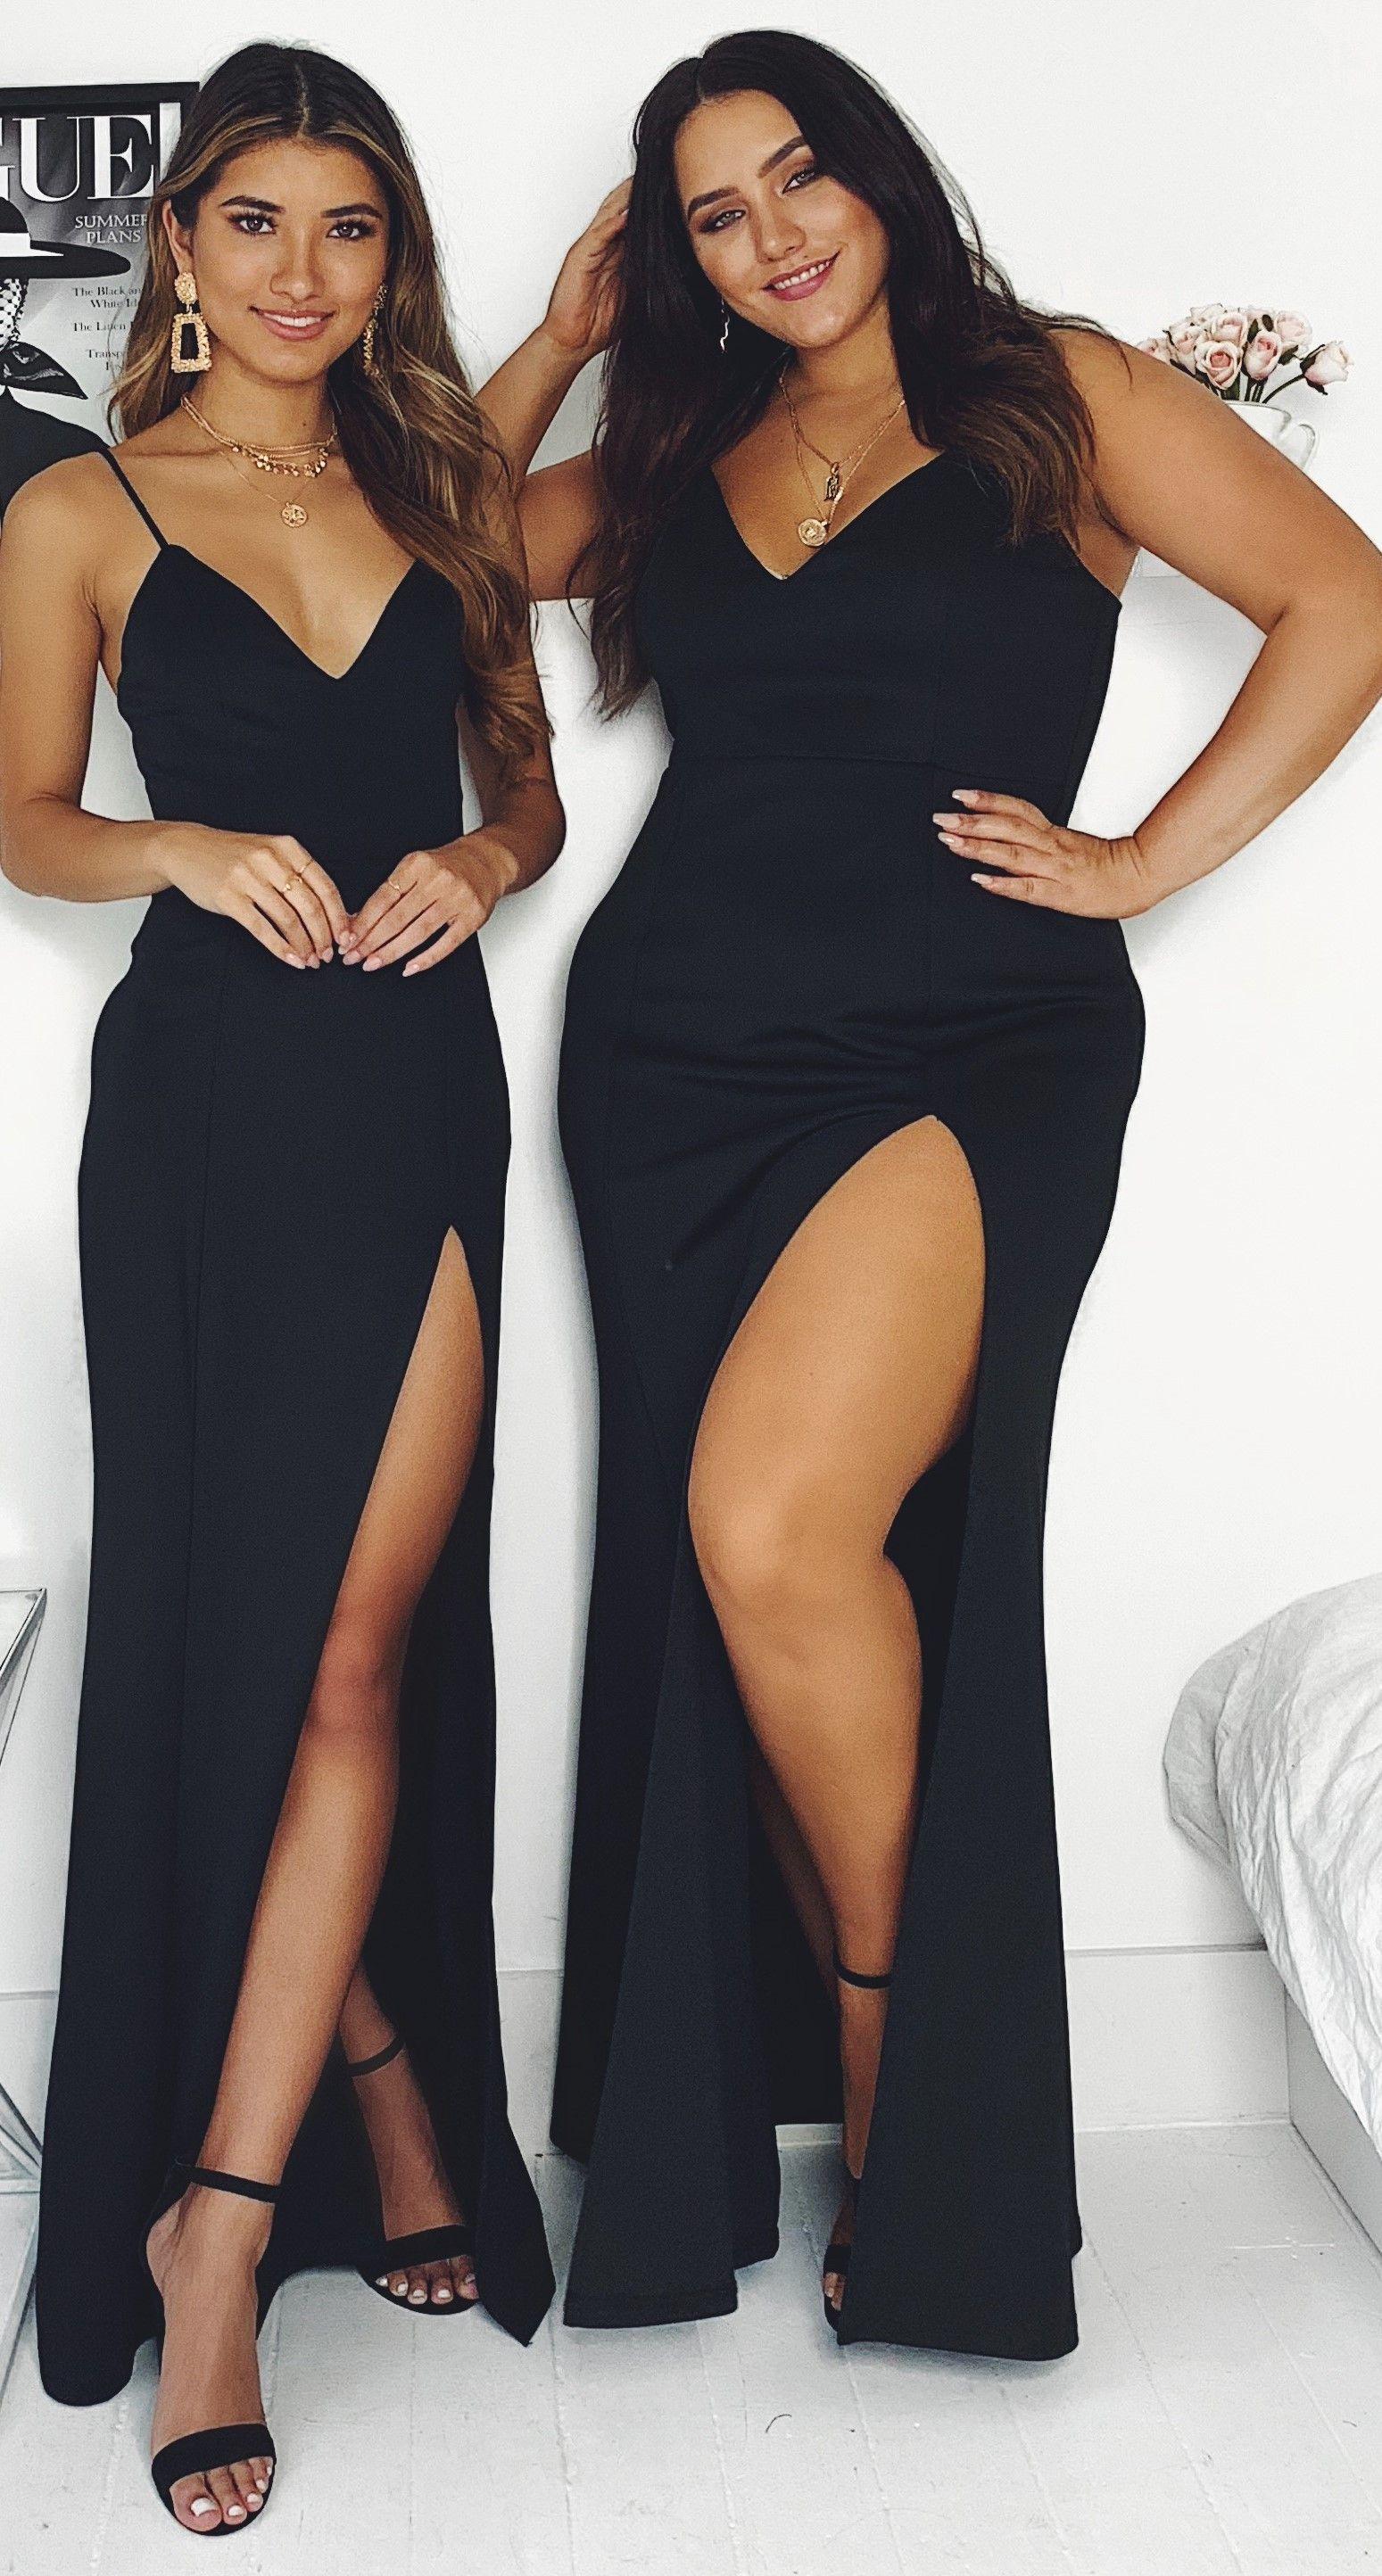 Turn Heads In This Glamorous Black Dress Dresses Online Australia Black Dress Outfits Ball Dresses [ 2888 x 1549 Pixel ]